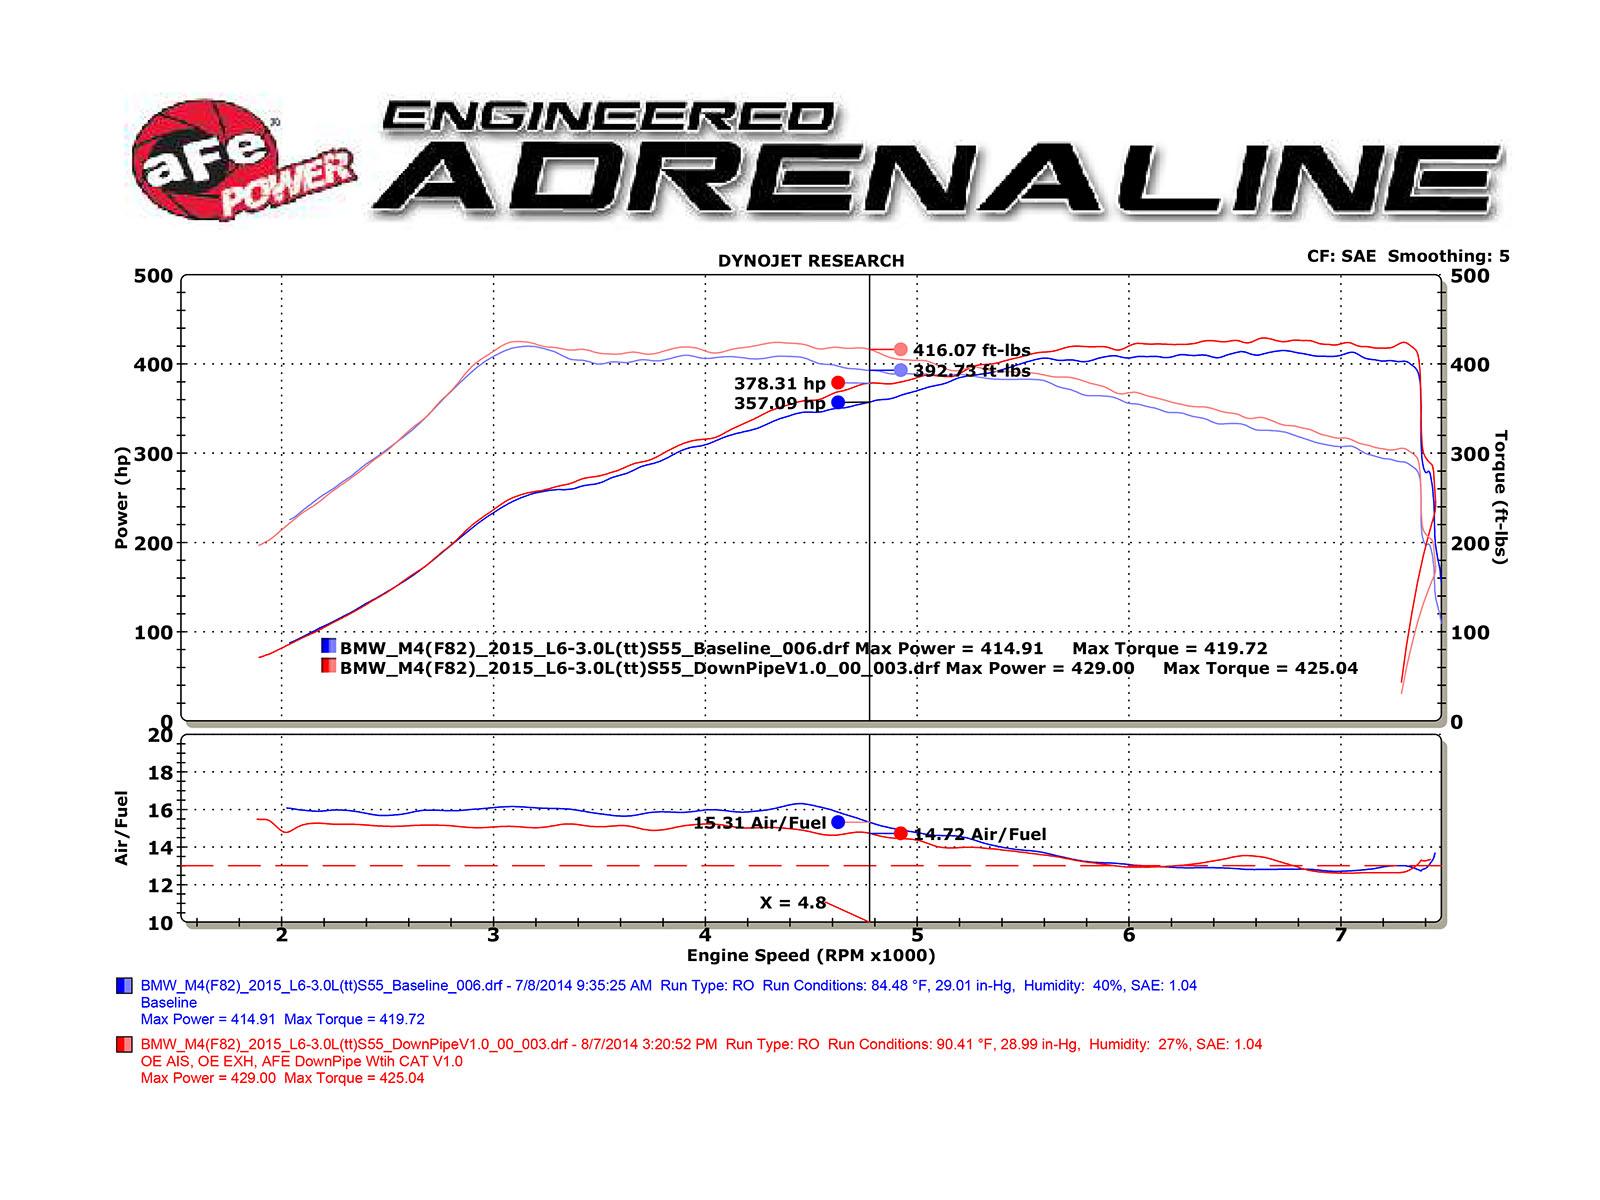 w124 500e wiring diagram for caravan electrics c32 amg engine html imageresizertool com